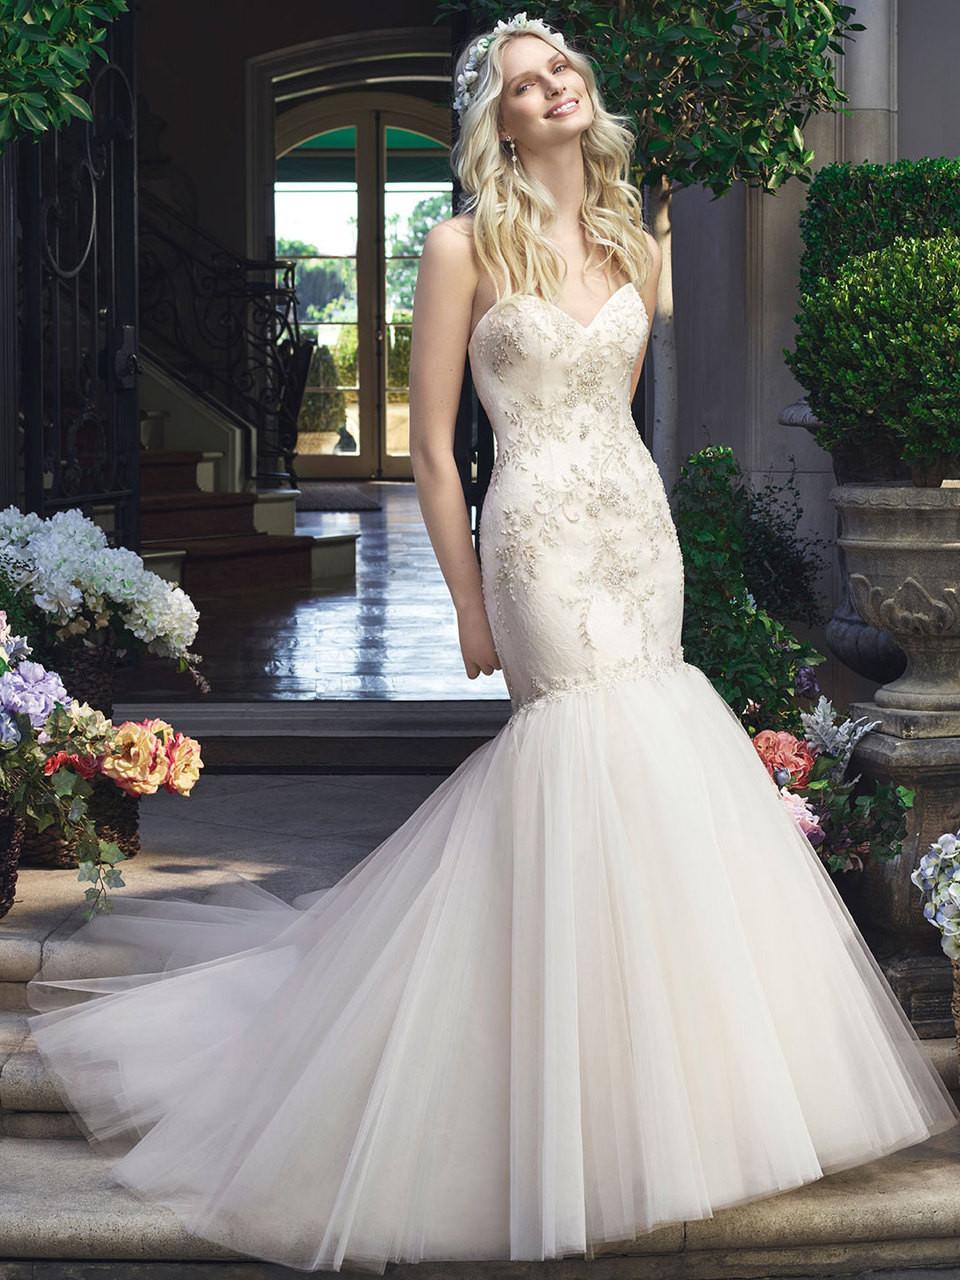 Casablanca 2219 Strapless Sweetheart Wedding Dress